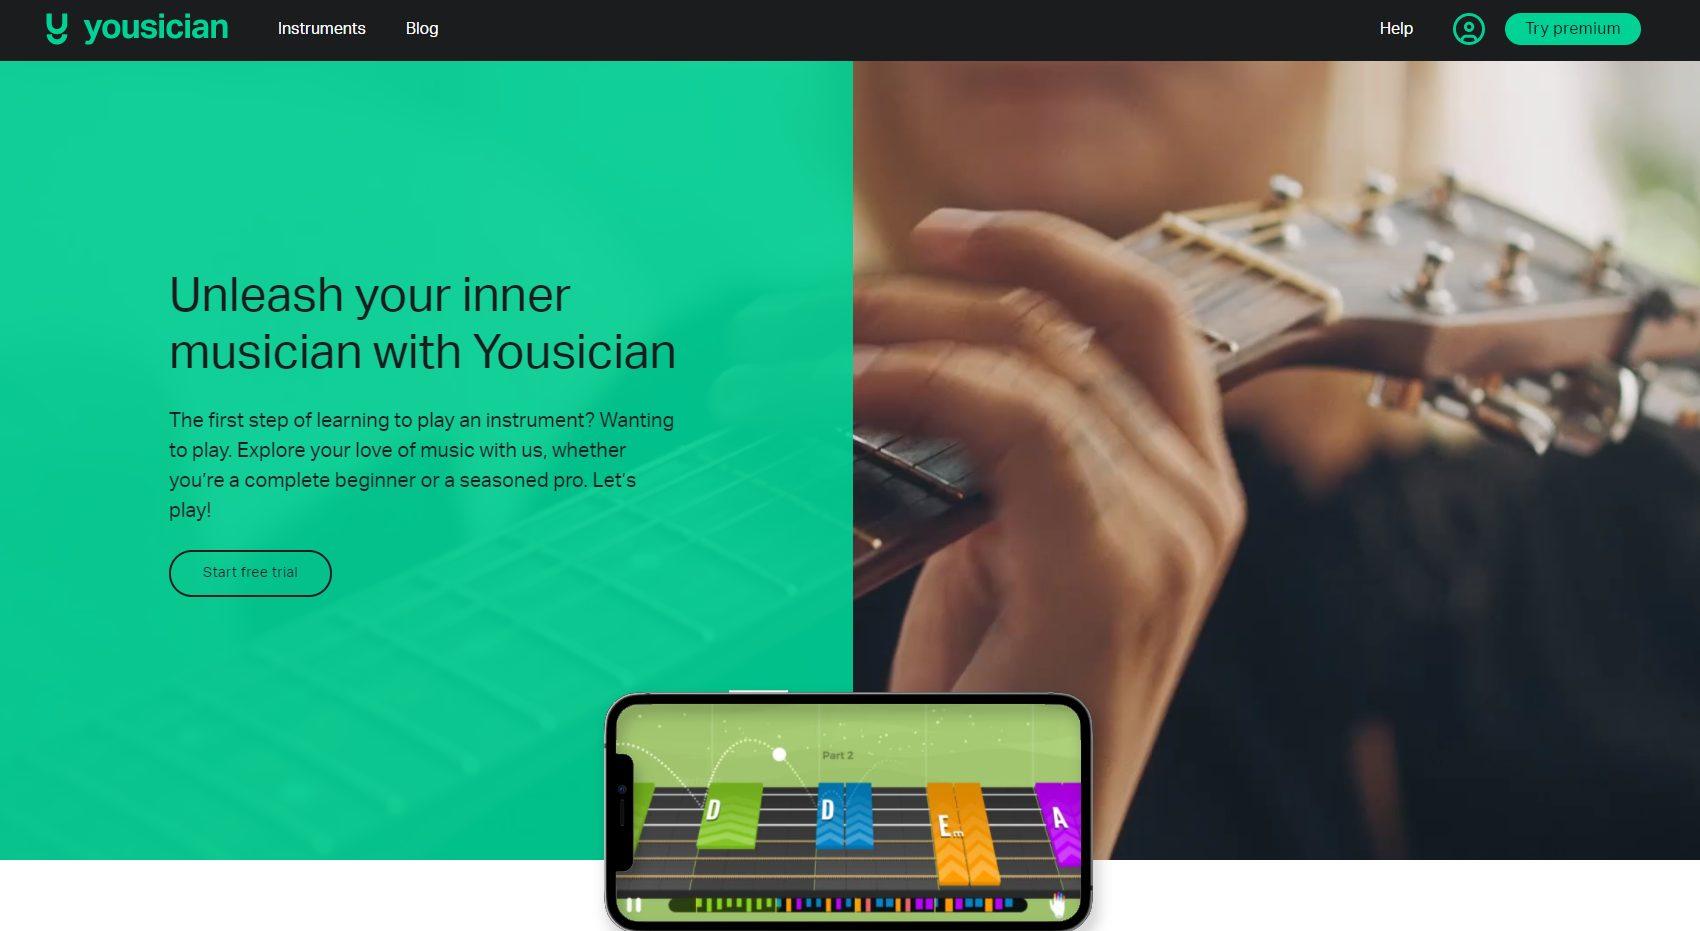 Yousician Homepage - June 2021